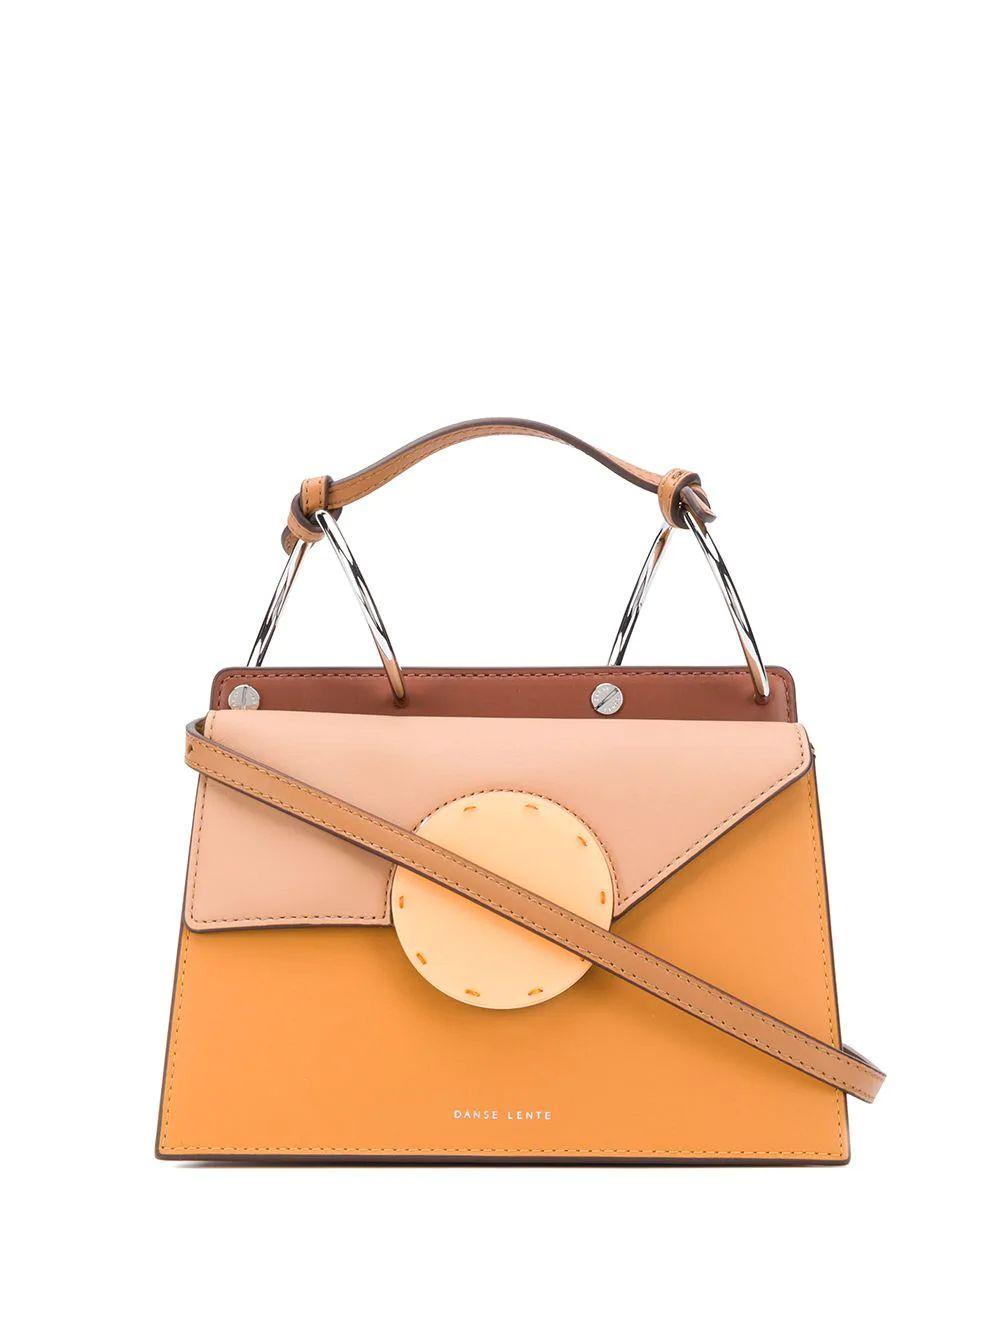 Phoebe Bis Bag Item # F20-18-2650